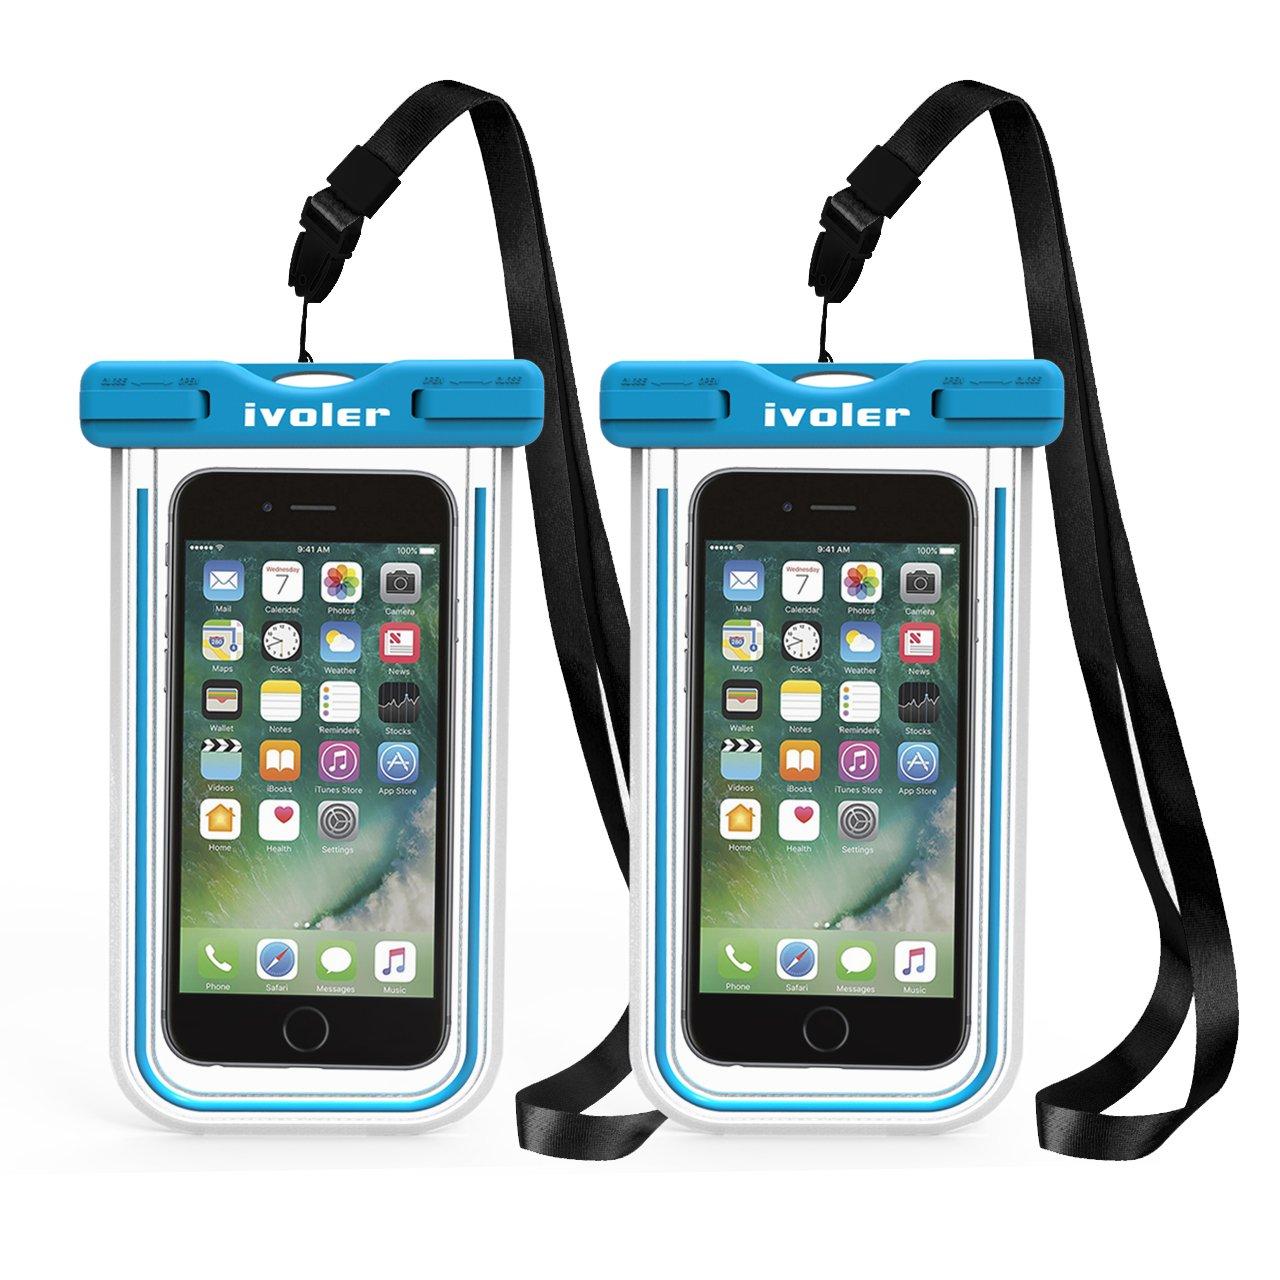 ivoler [IPX8 Certificado] [2 Unidades] Funda Bolsa Móvil Impermeable Universal para Xiaomi, iPhone, Samsung Galaxy, Huawei, Smartphones, Monedas, Pasaporte, etc. (Azul+Azul): Amazon.es: Electrónica